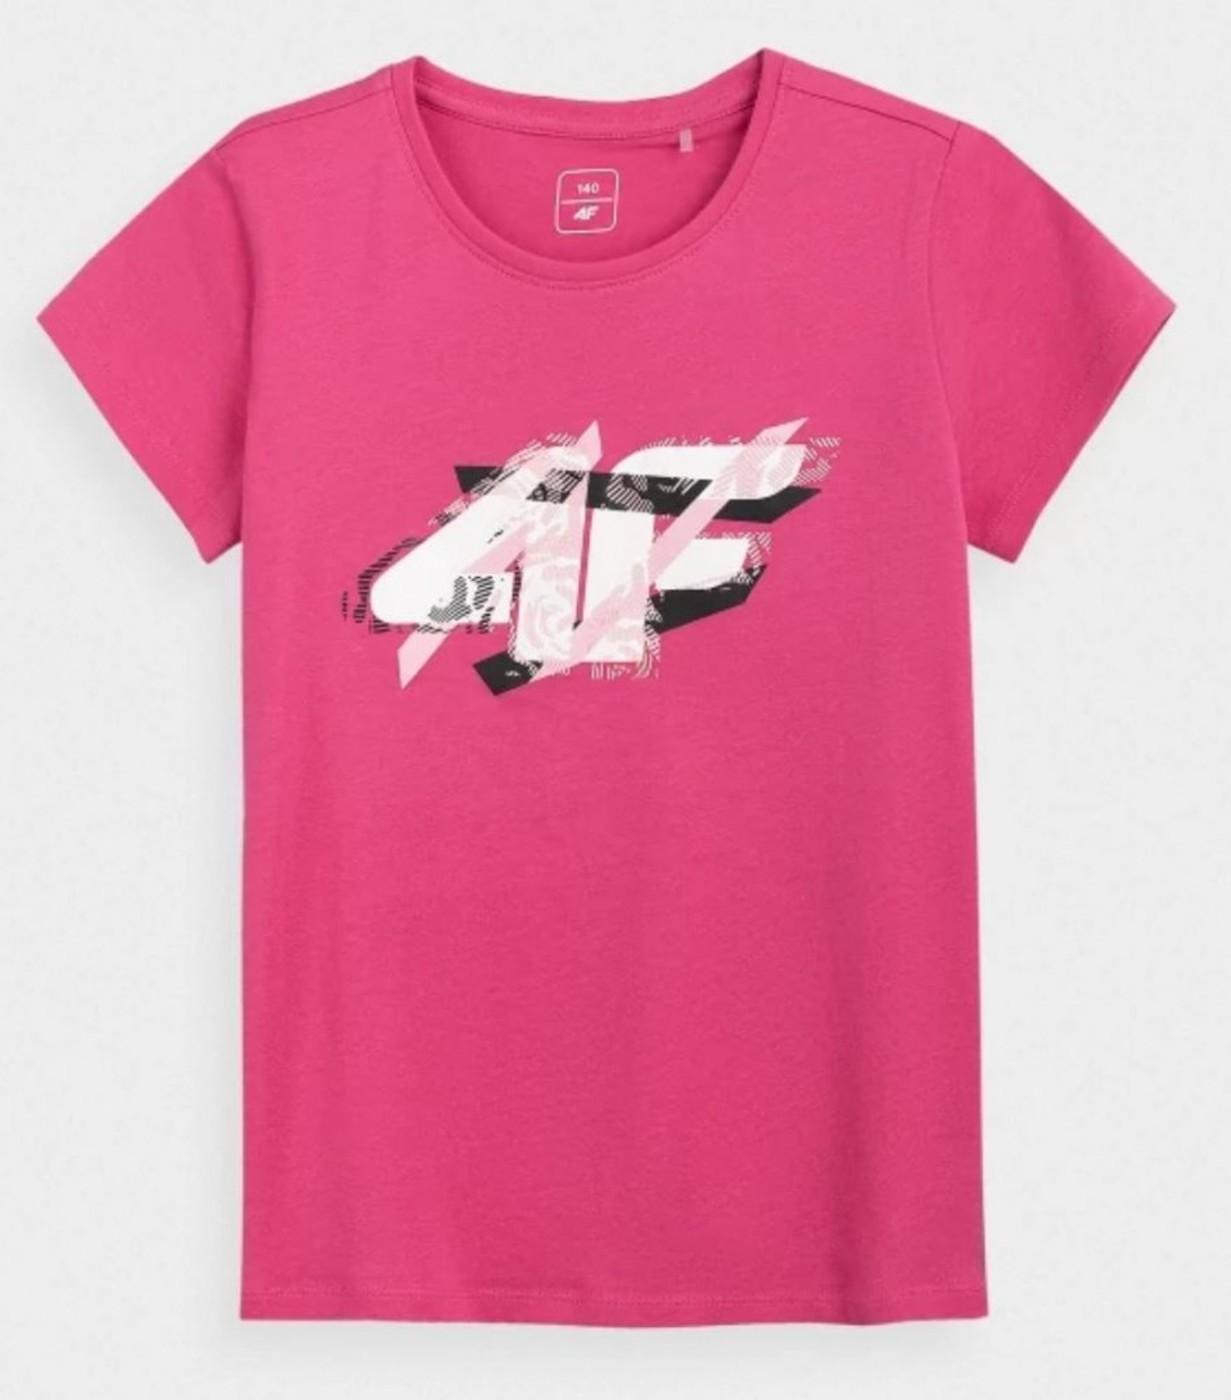 4F JTSD002 Mädchen T-Shirt - Kinder